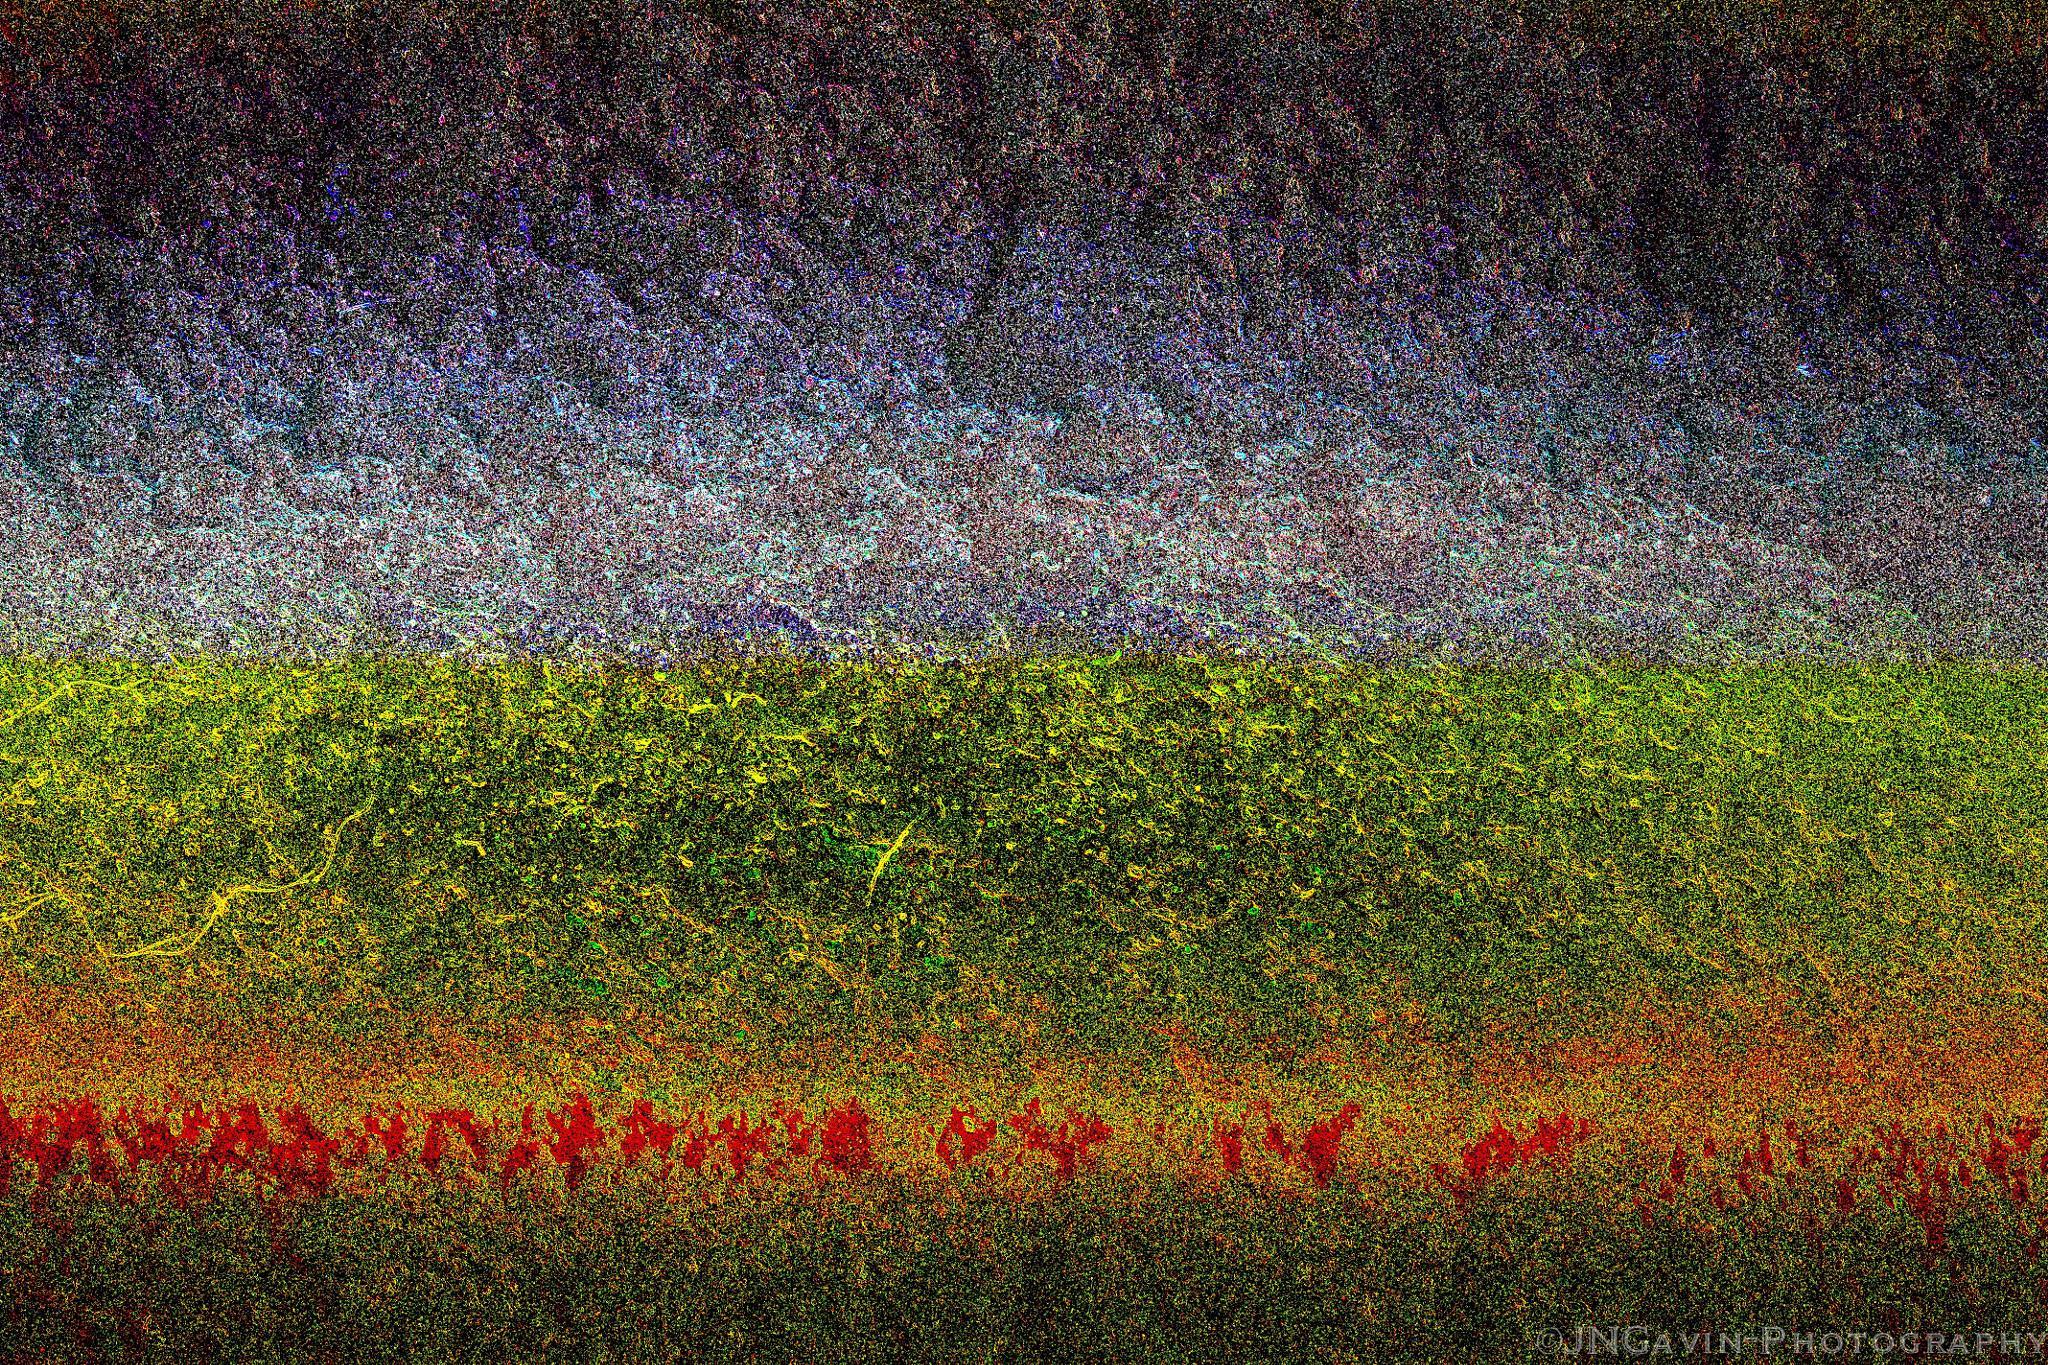 Greener Pastures by John Gavin